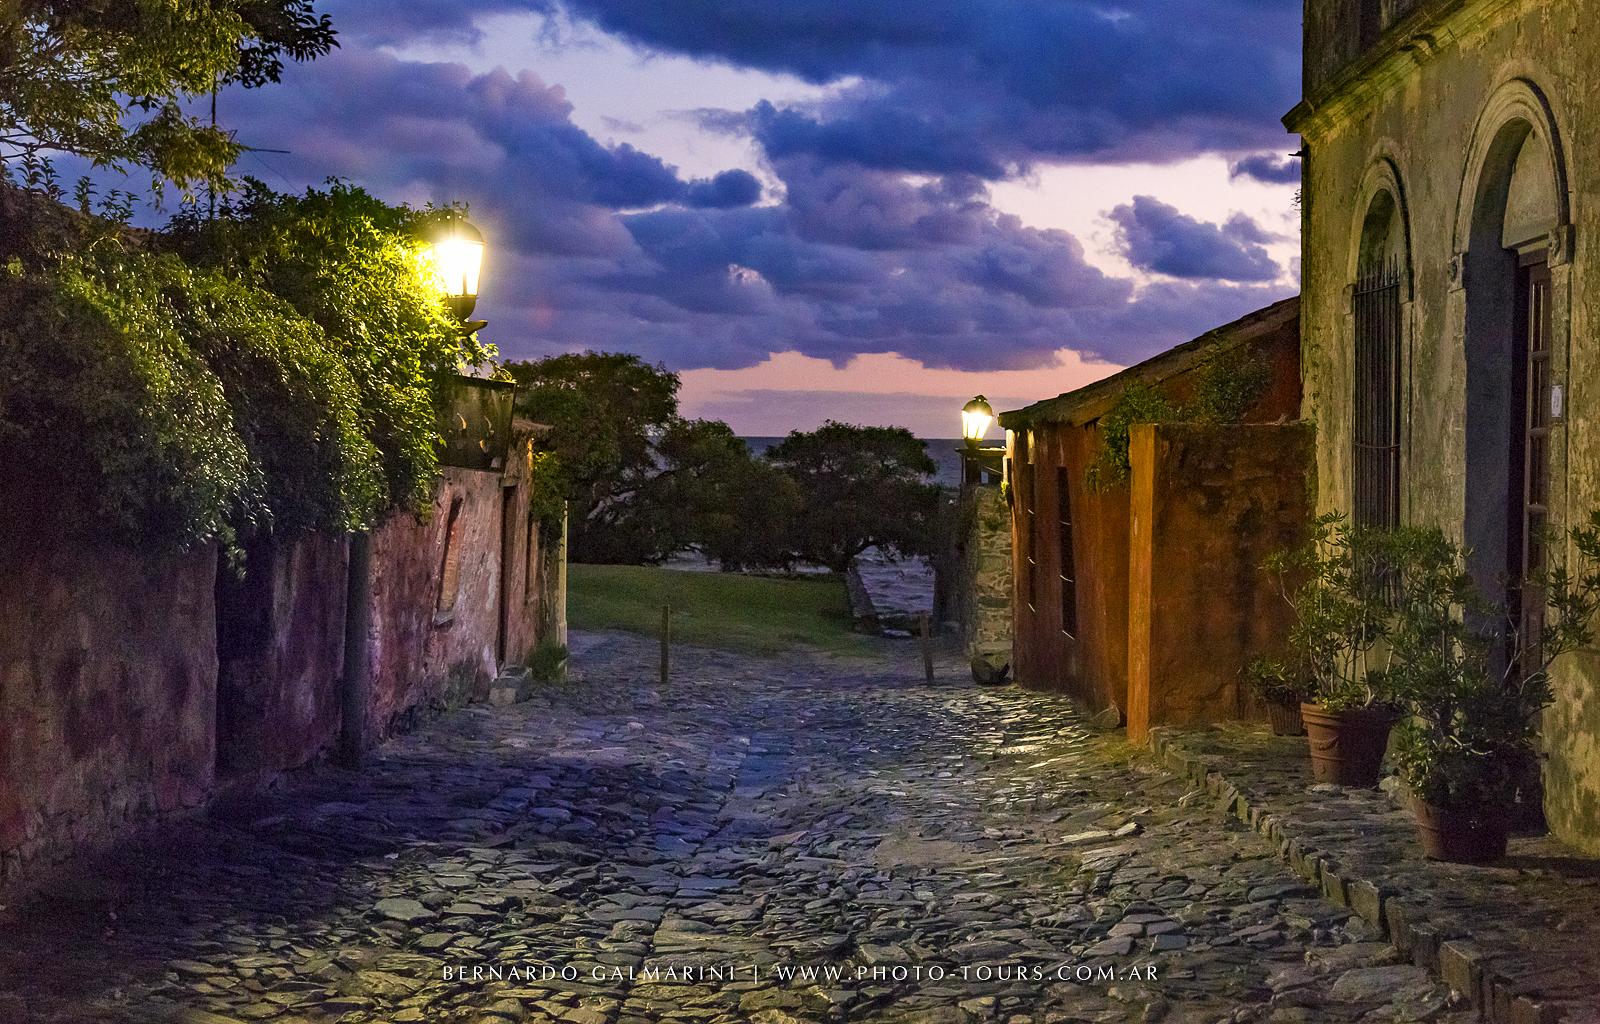 PHOTO TOURS BUENOS AIRES2601-RET-S-F